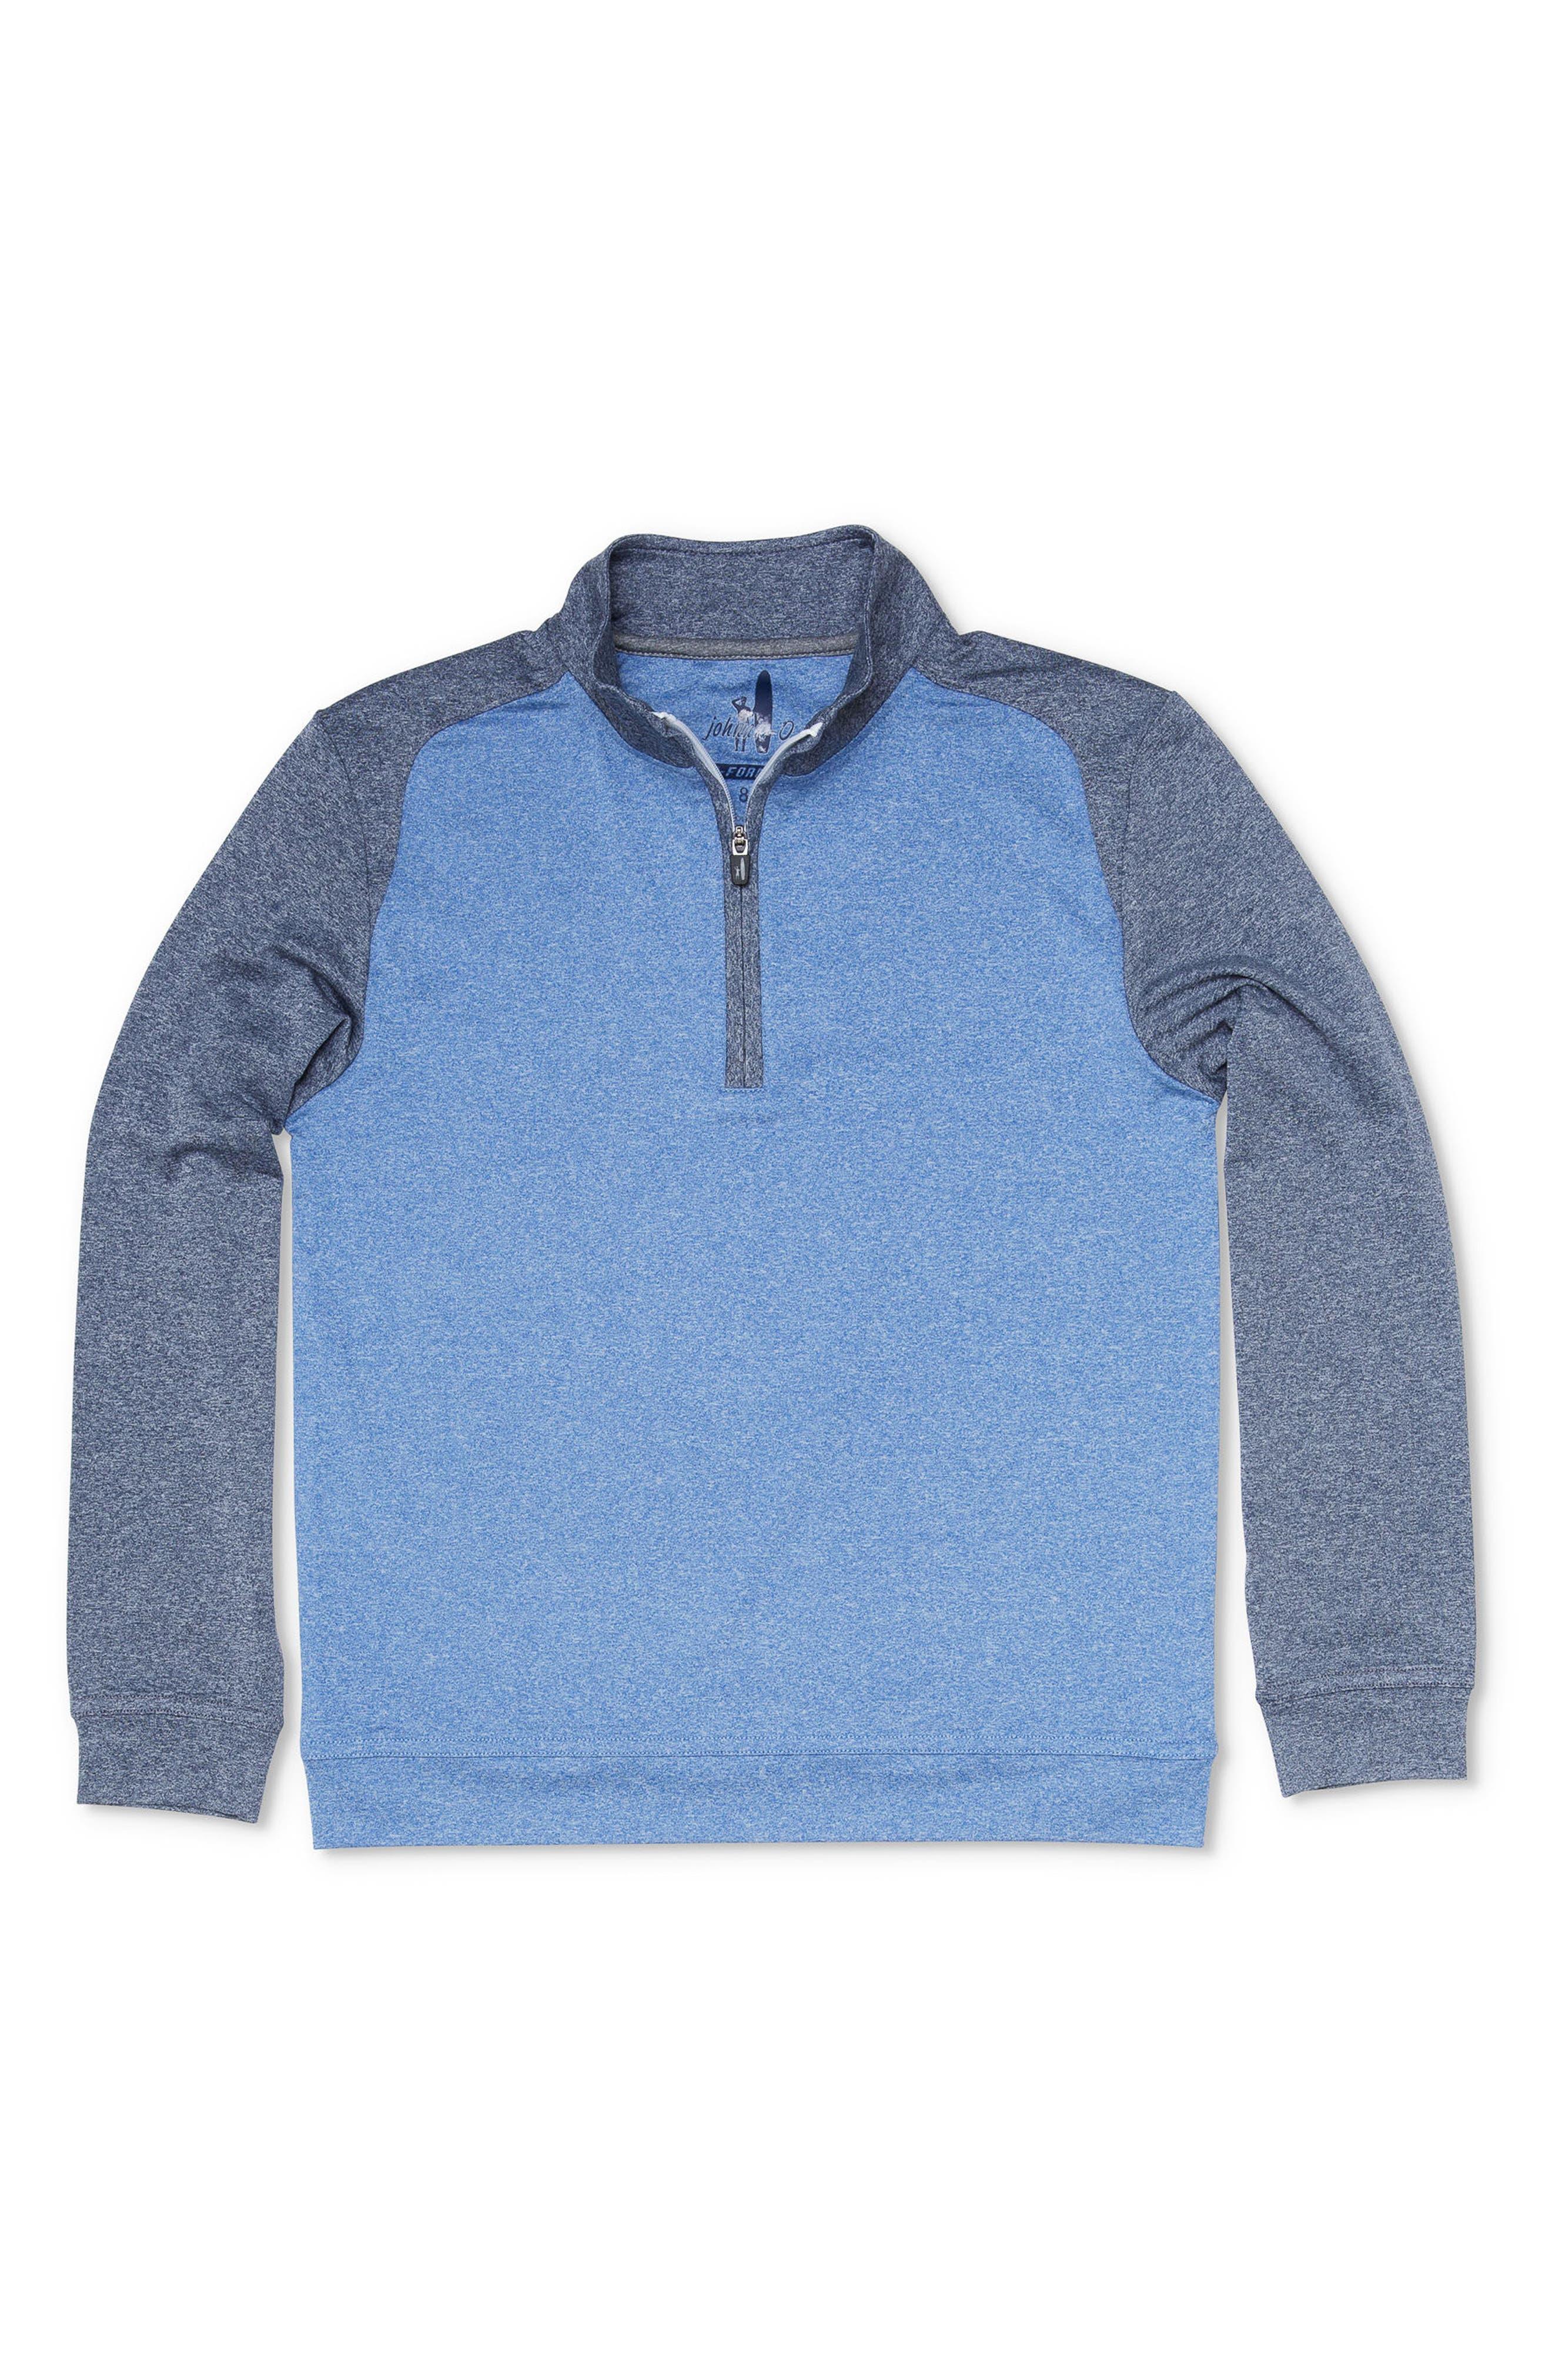 johnnie-o Sway Quarter Zip Pullover (Little Boys & Big Boys)